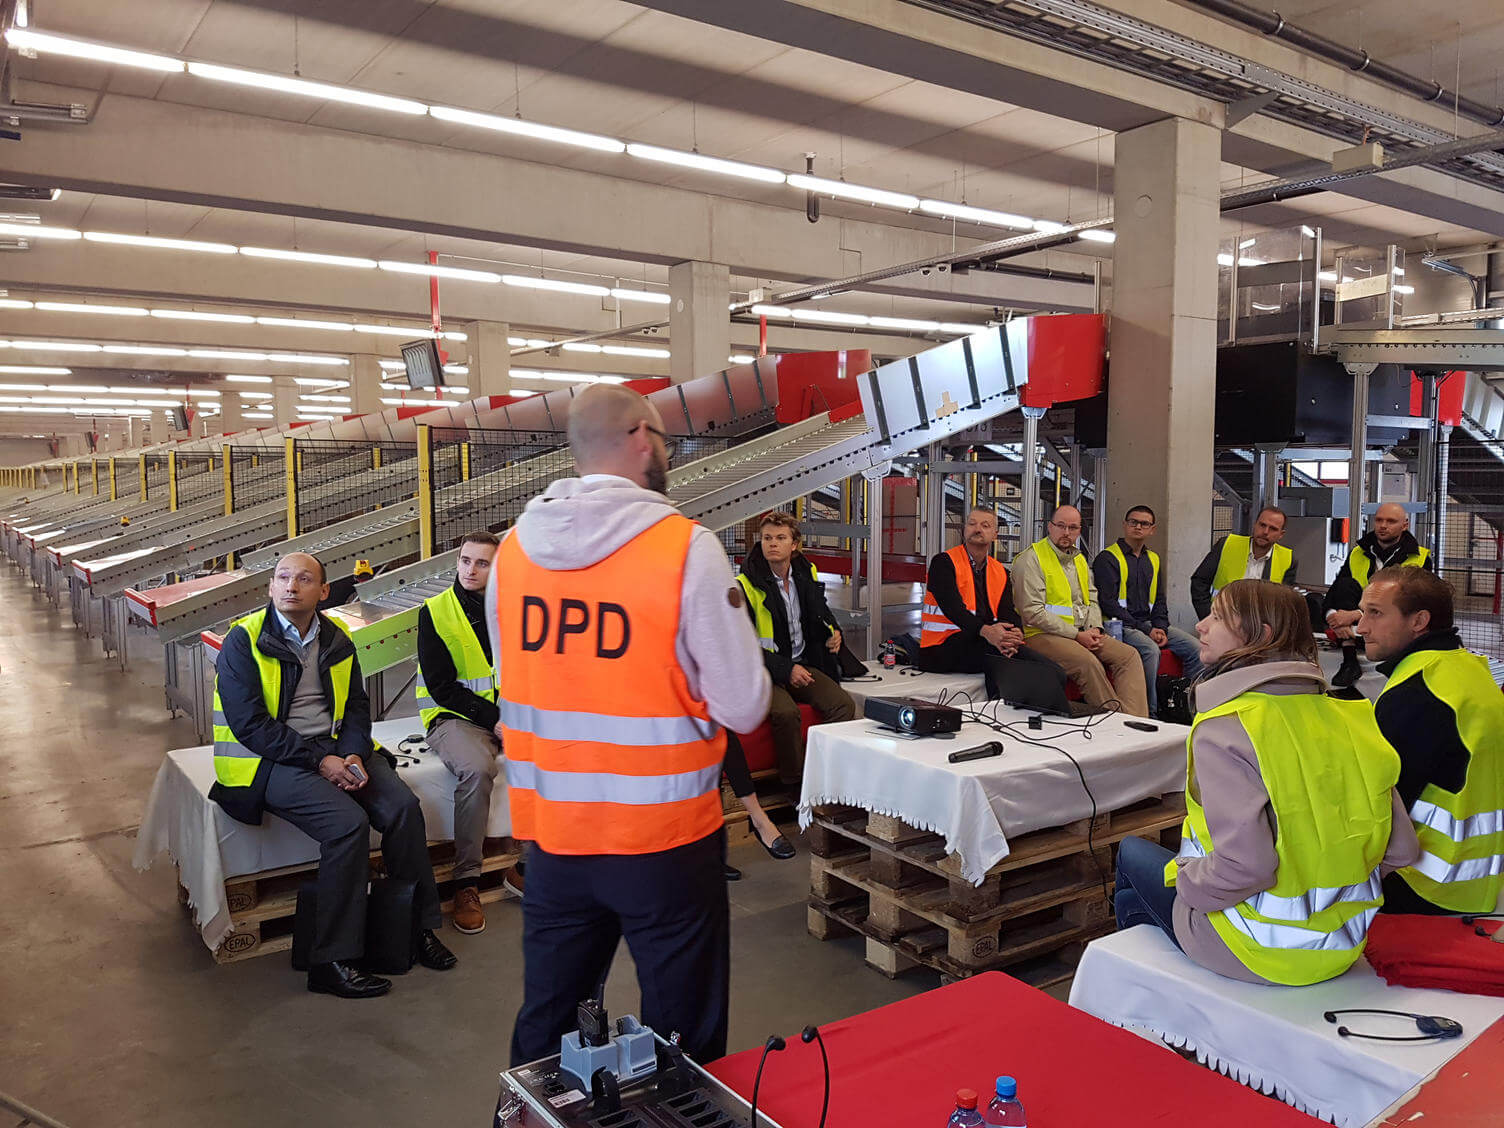 Inspire 925 organizes Innovation Day at DPD Switzerland